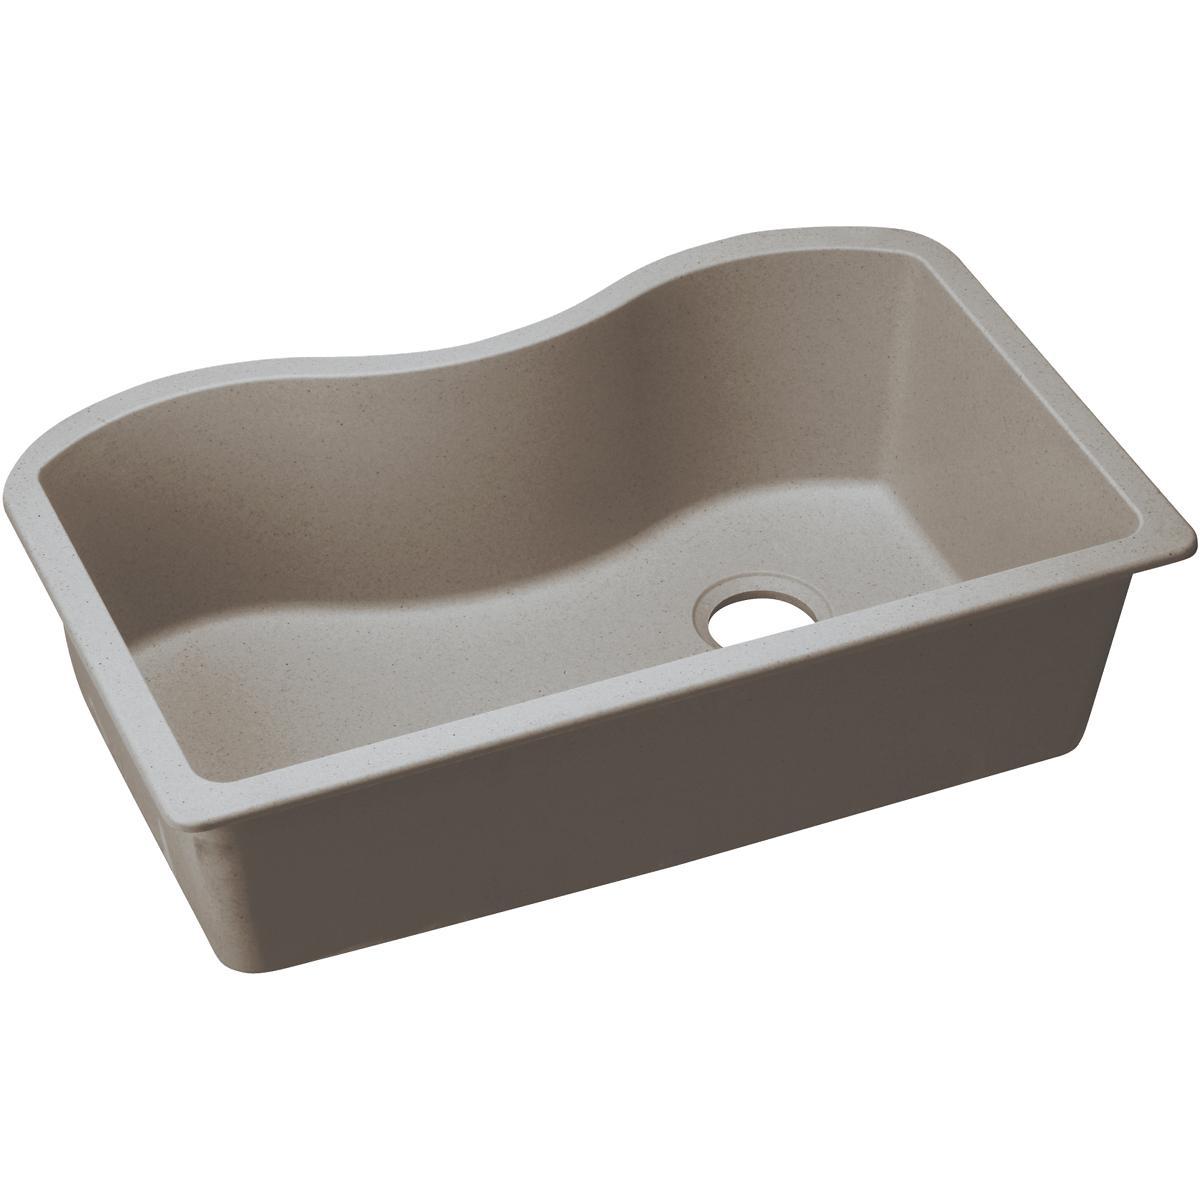 elgus3322rgr greige quartz classic 33 x 20 x 9 5 single bowl undermount kitchen sink